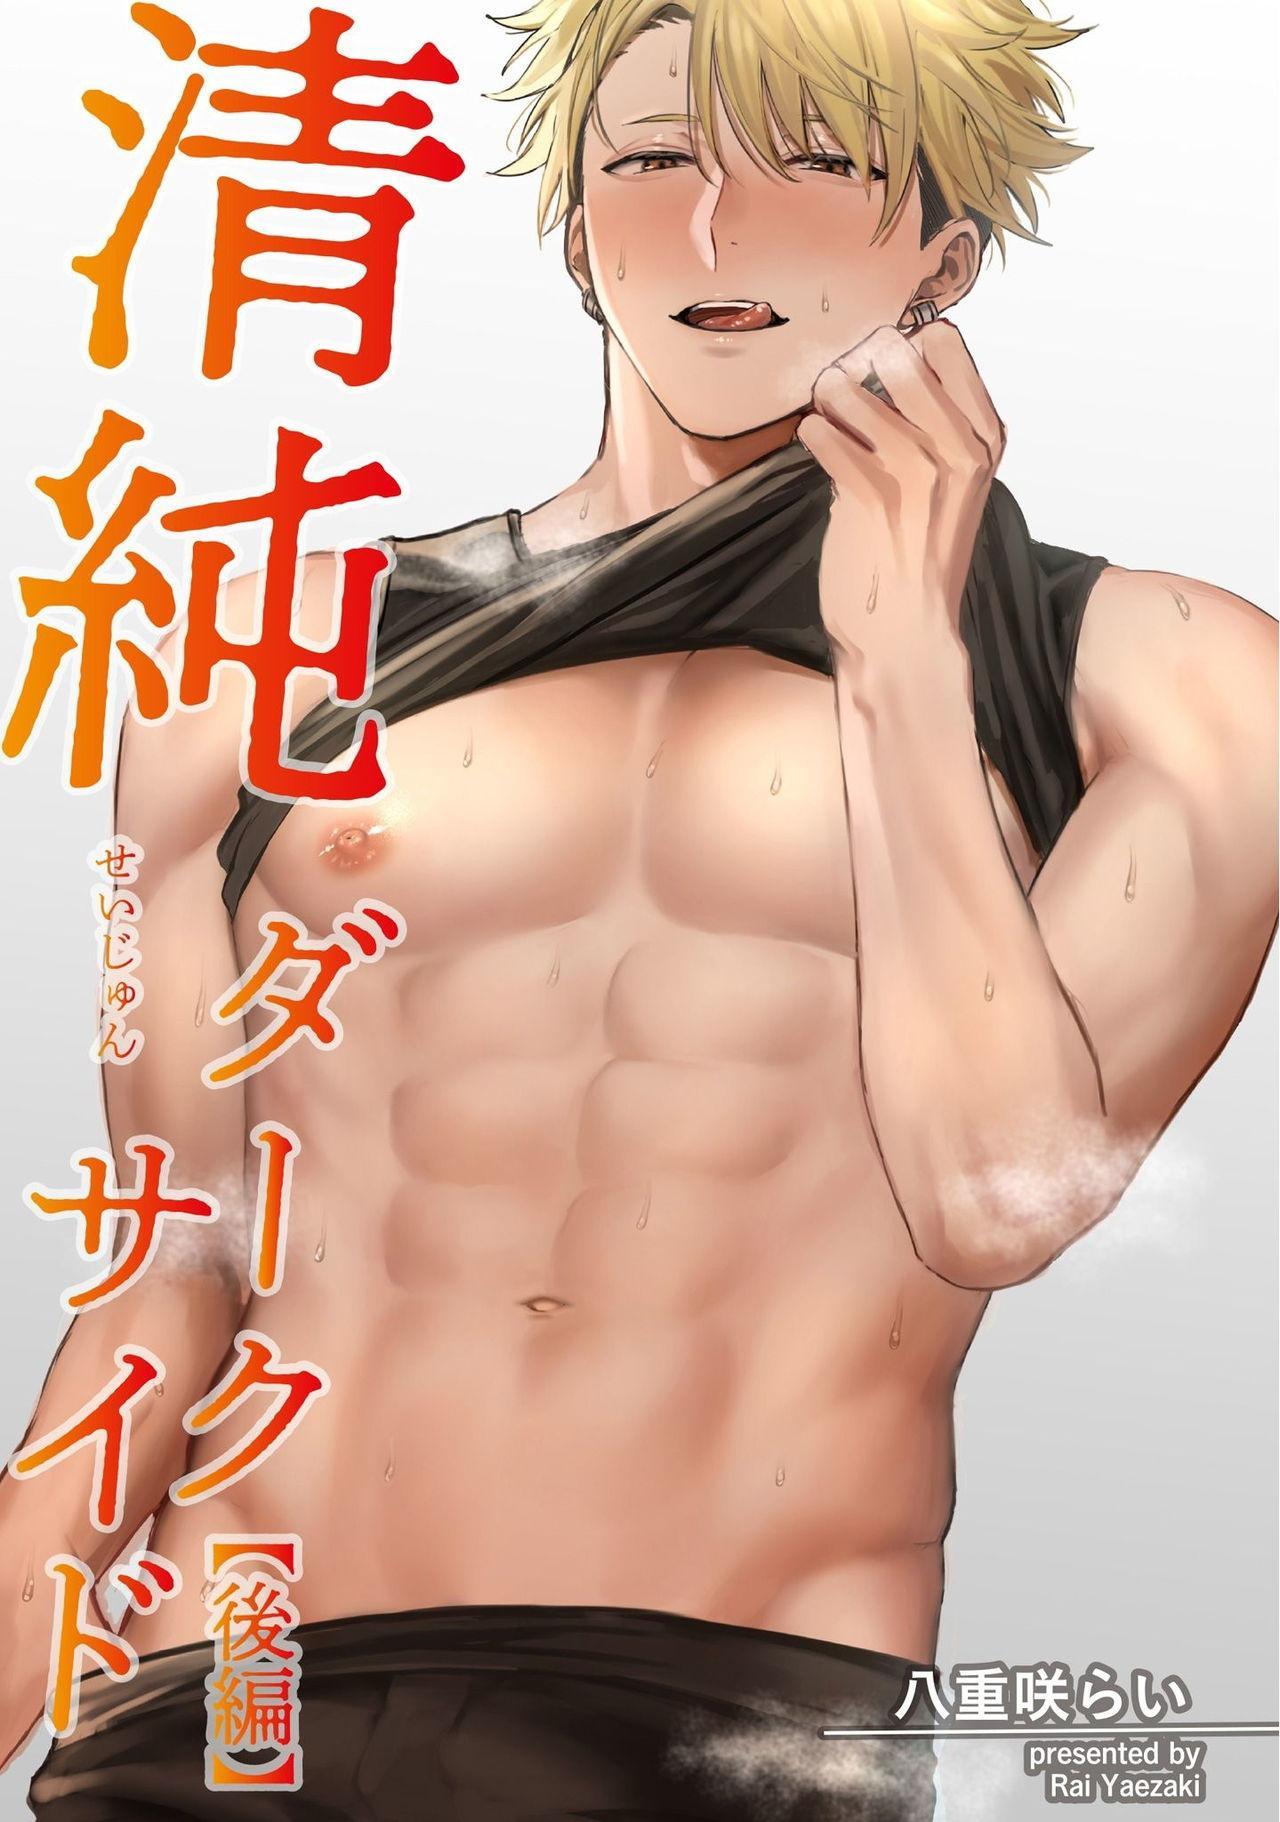 Seijun Dark Side Zenpen   清纯阴暗面 前篇+后篇 34